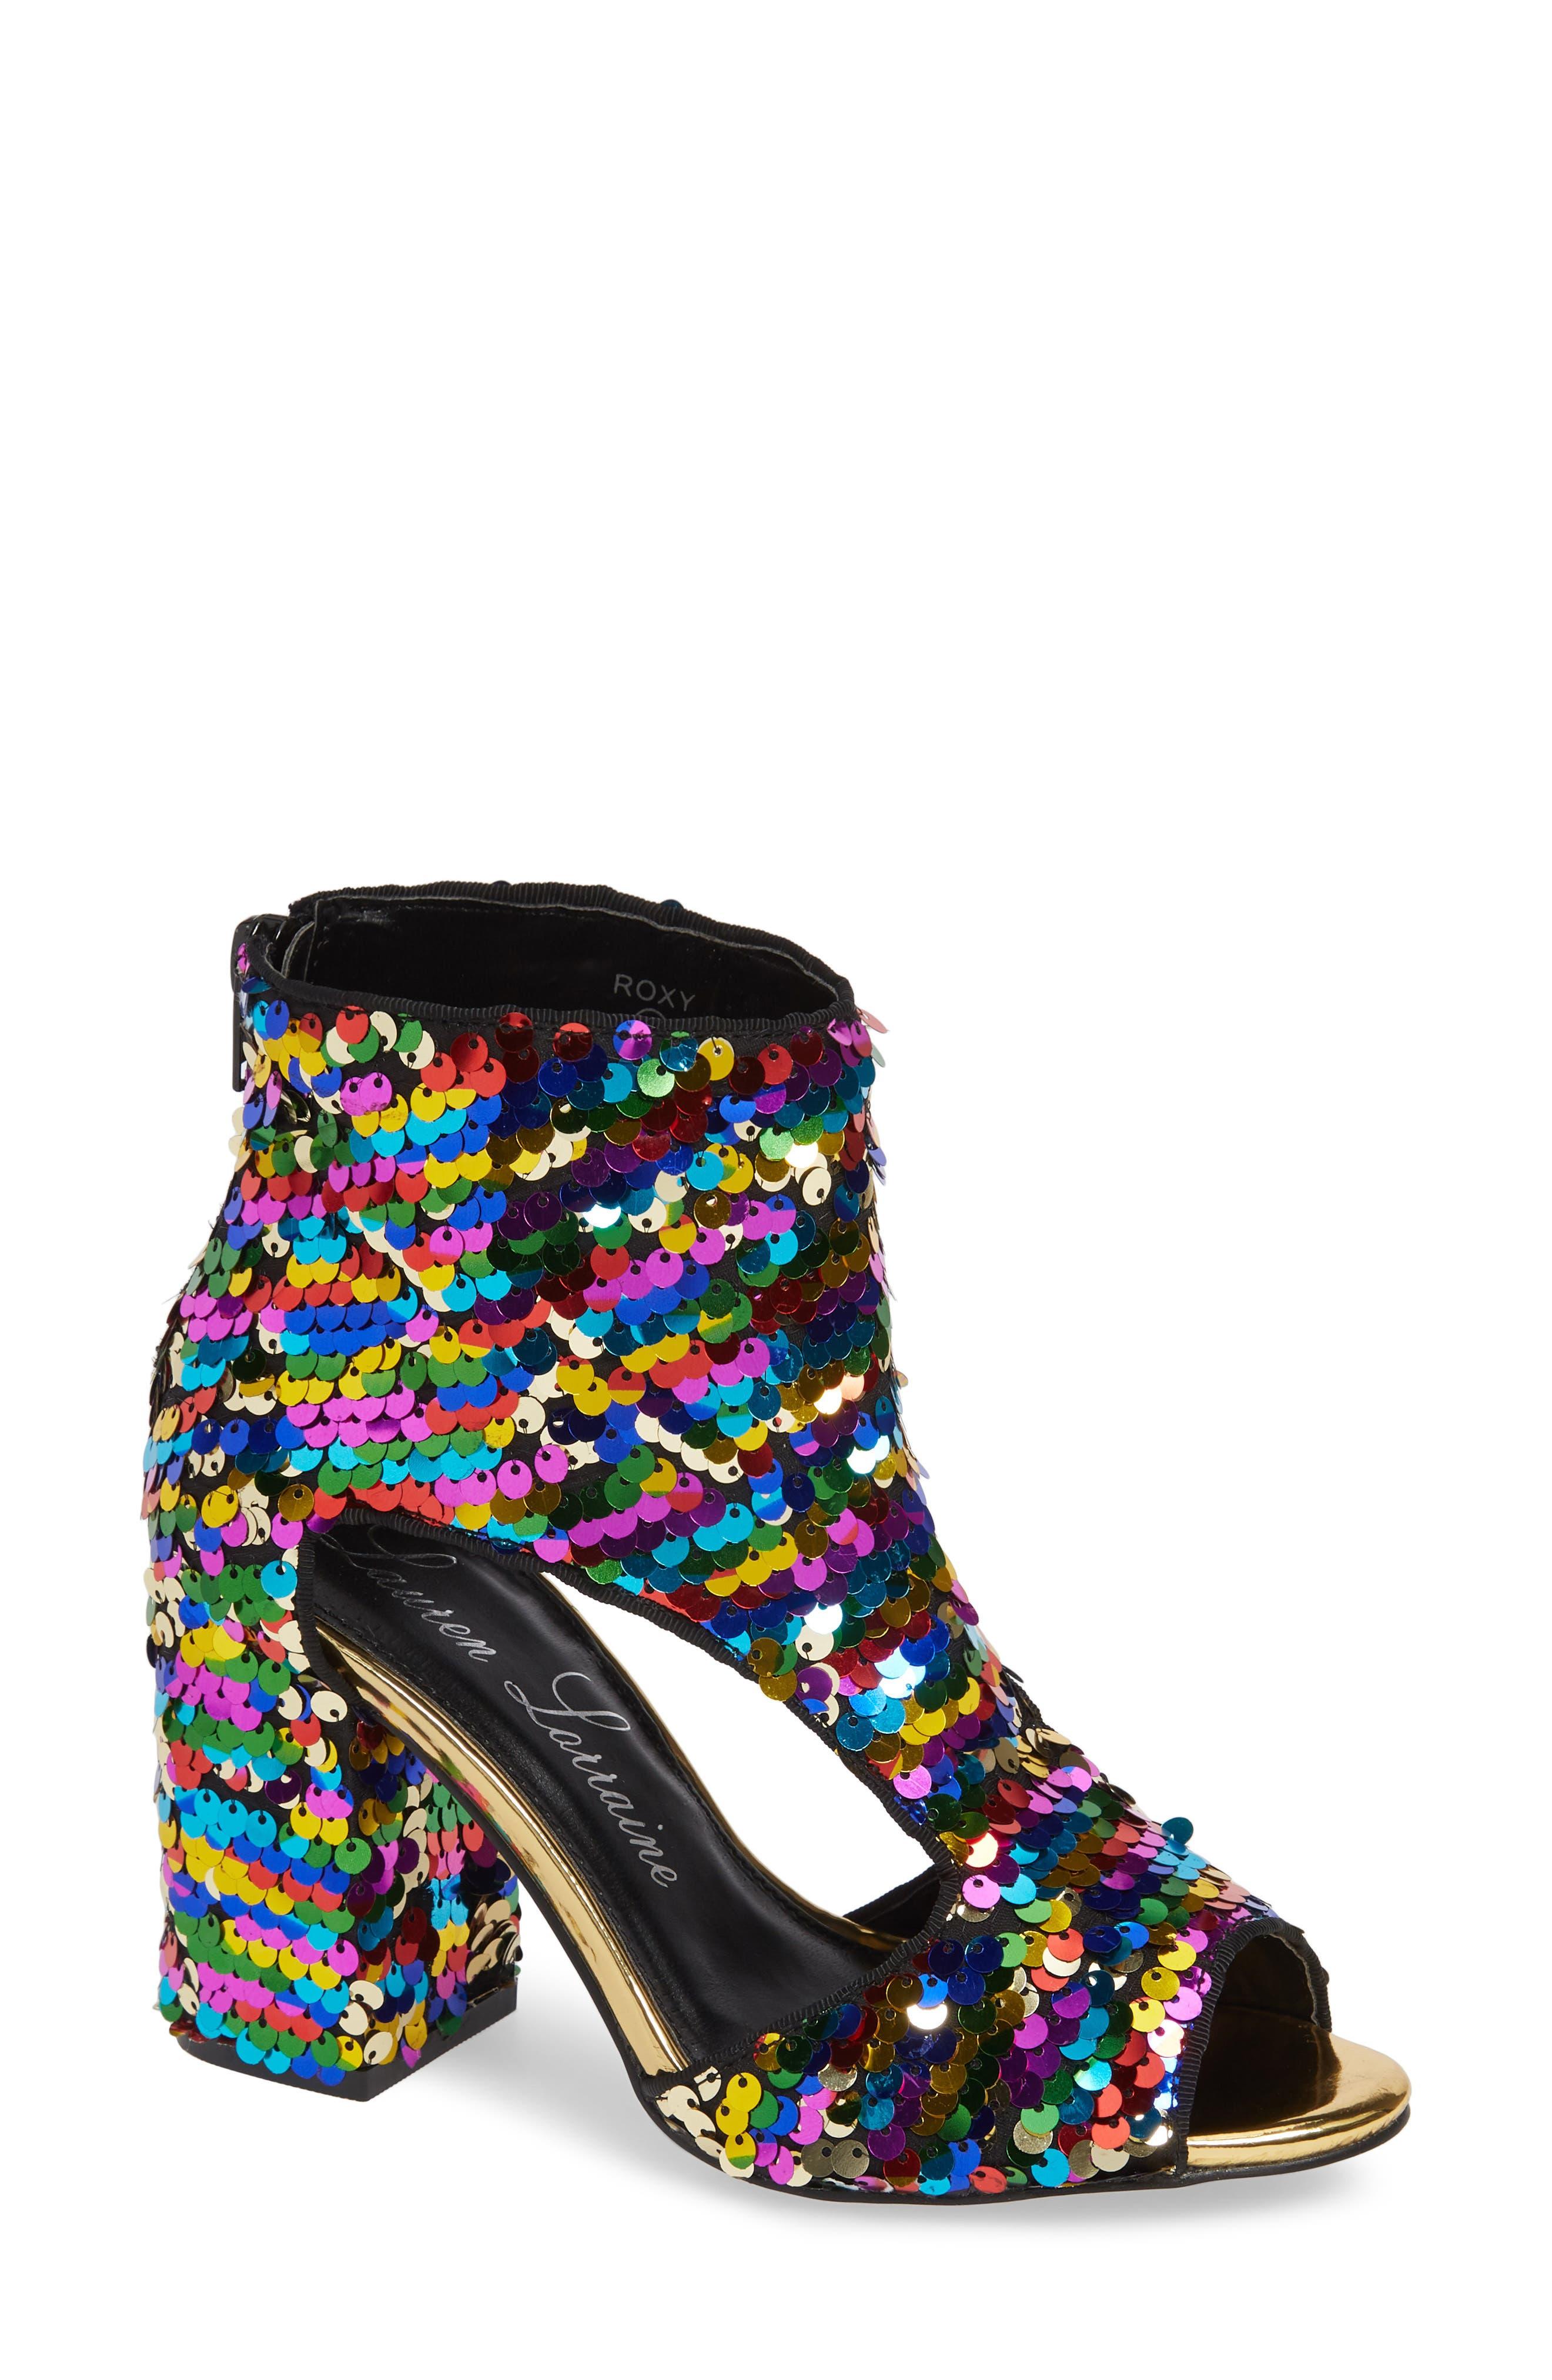 LAUREN LORRAINE Roxy Sequin Sandal, Main, color, 710